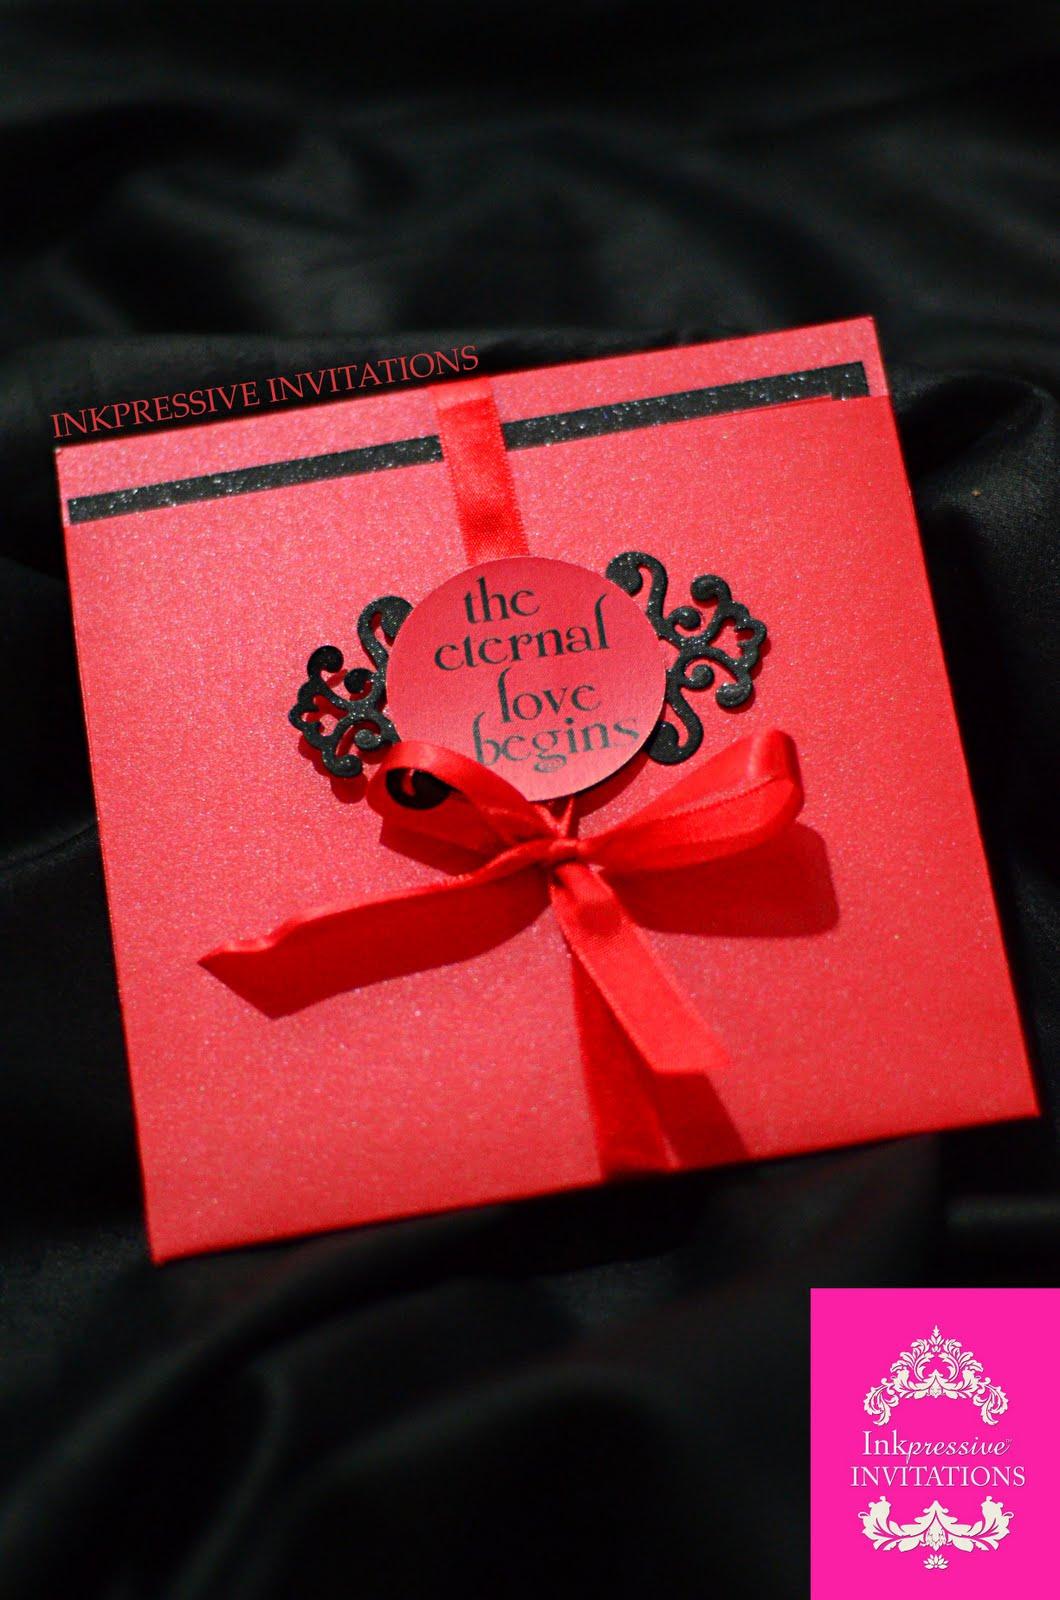 Twilight Saga Birthday Bash 07.11.2011   INKPRESSIVE INVITATIONS